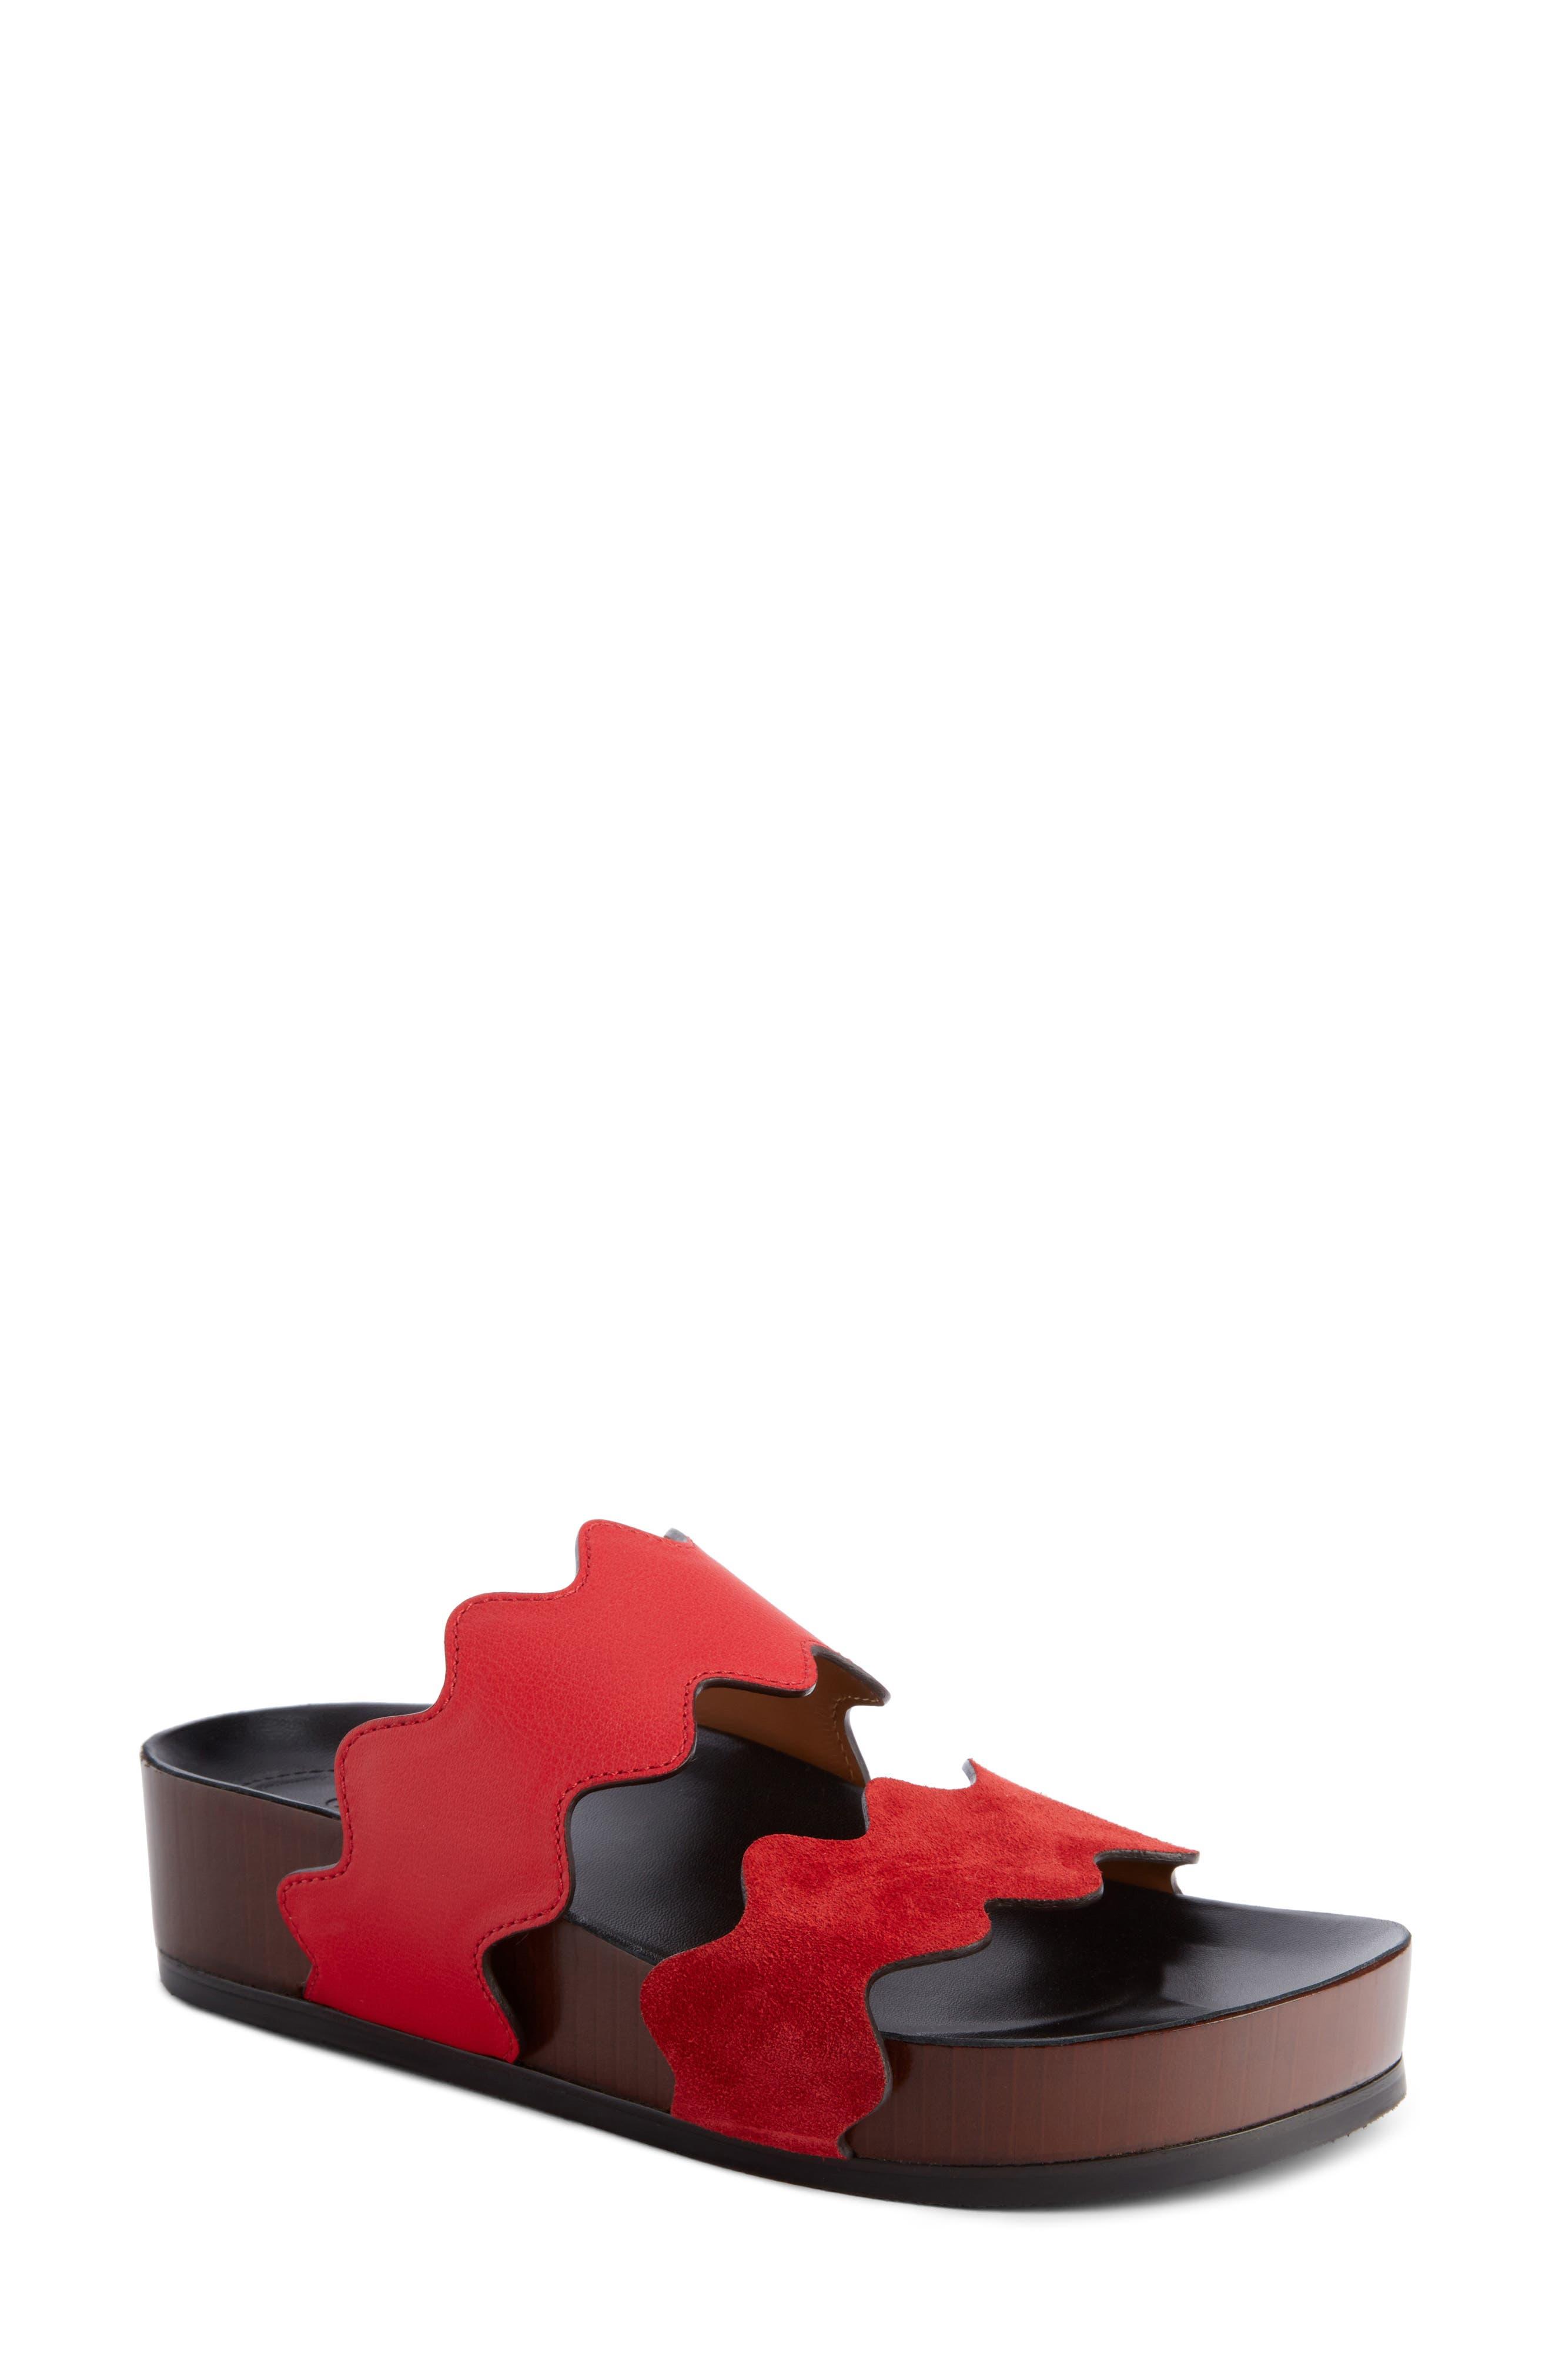 Lauren Platform Sandal,                             Main thumbnail 1, color,                             Gipsy Red